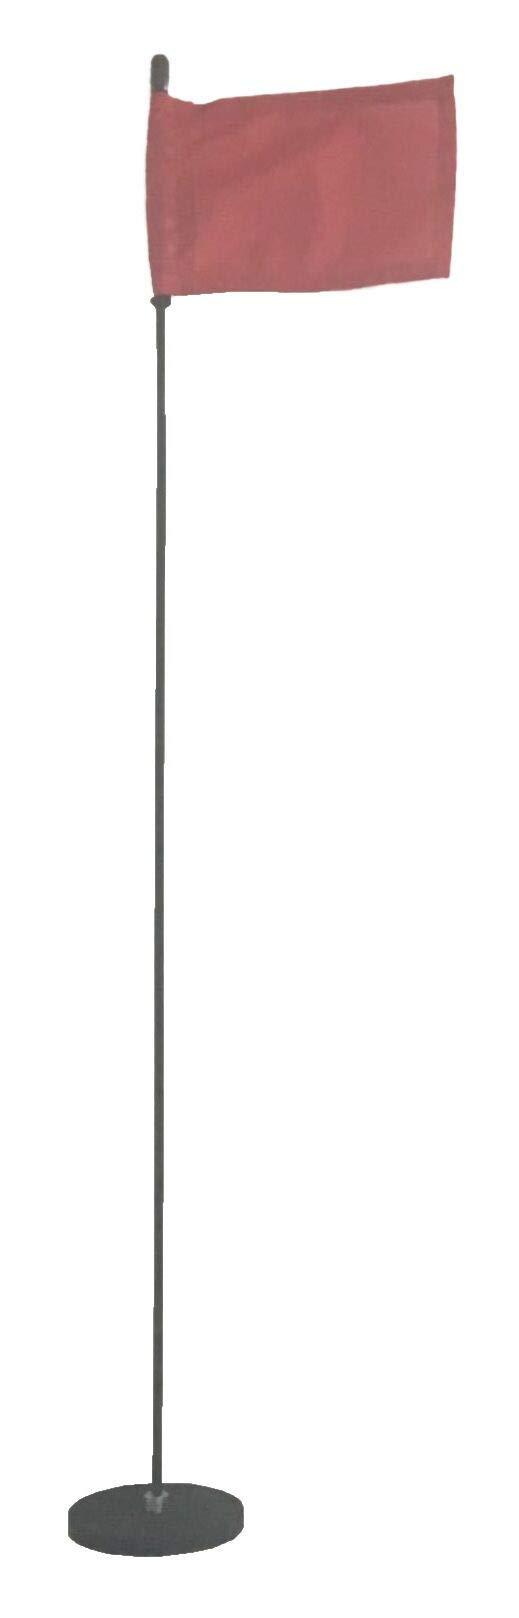 Magnetic Base Flag Holder - Hold Force 44 lbs. Flex Steel Spring Pole 30 inch (4 x 6) Red Flag